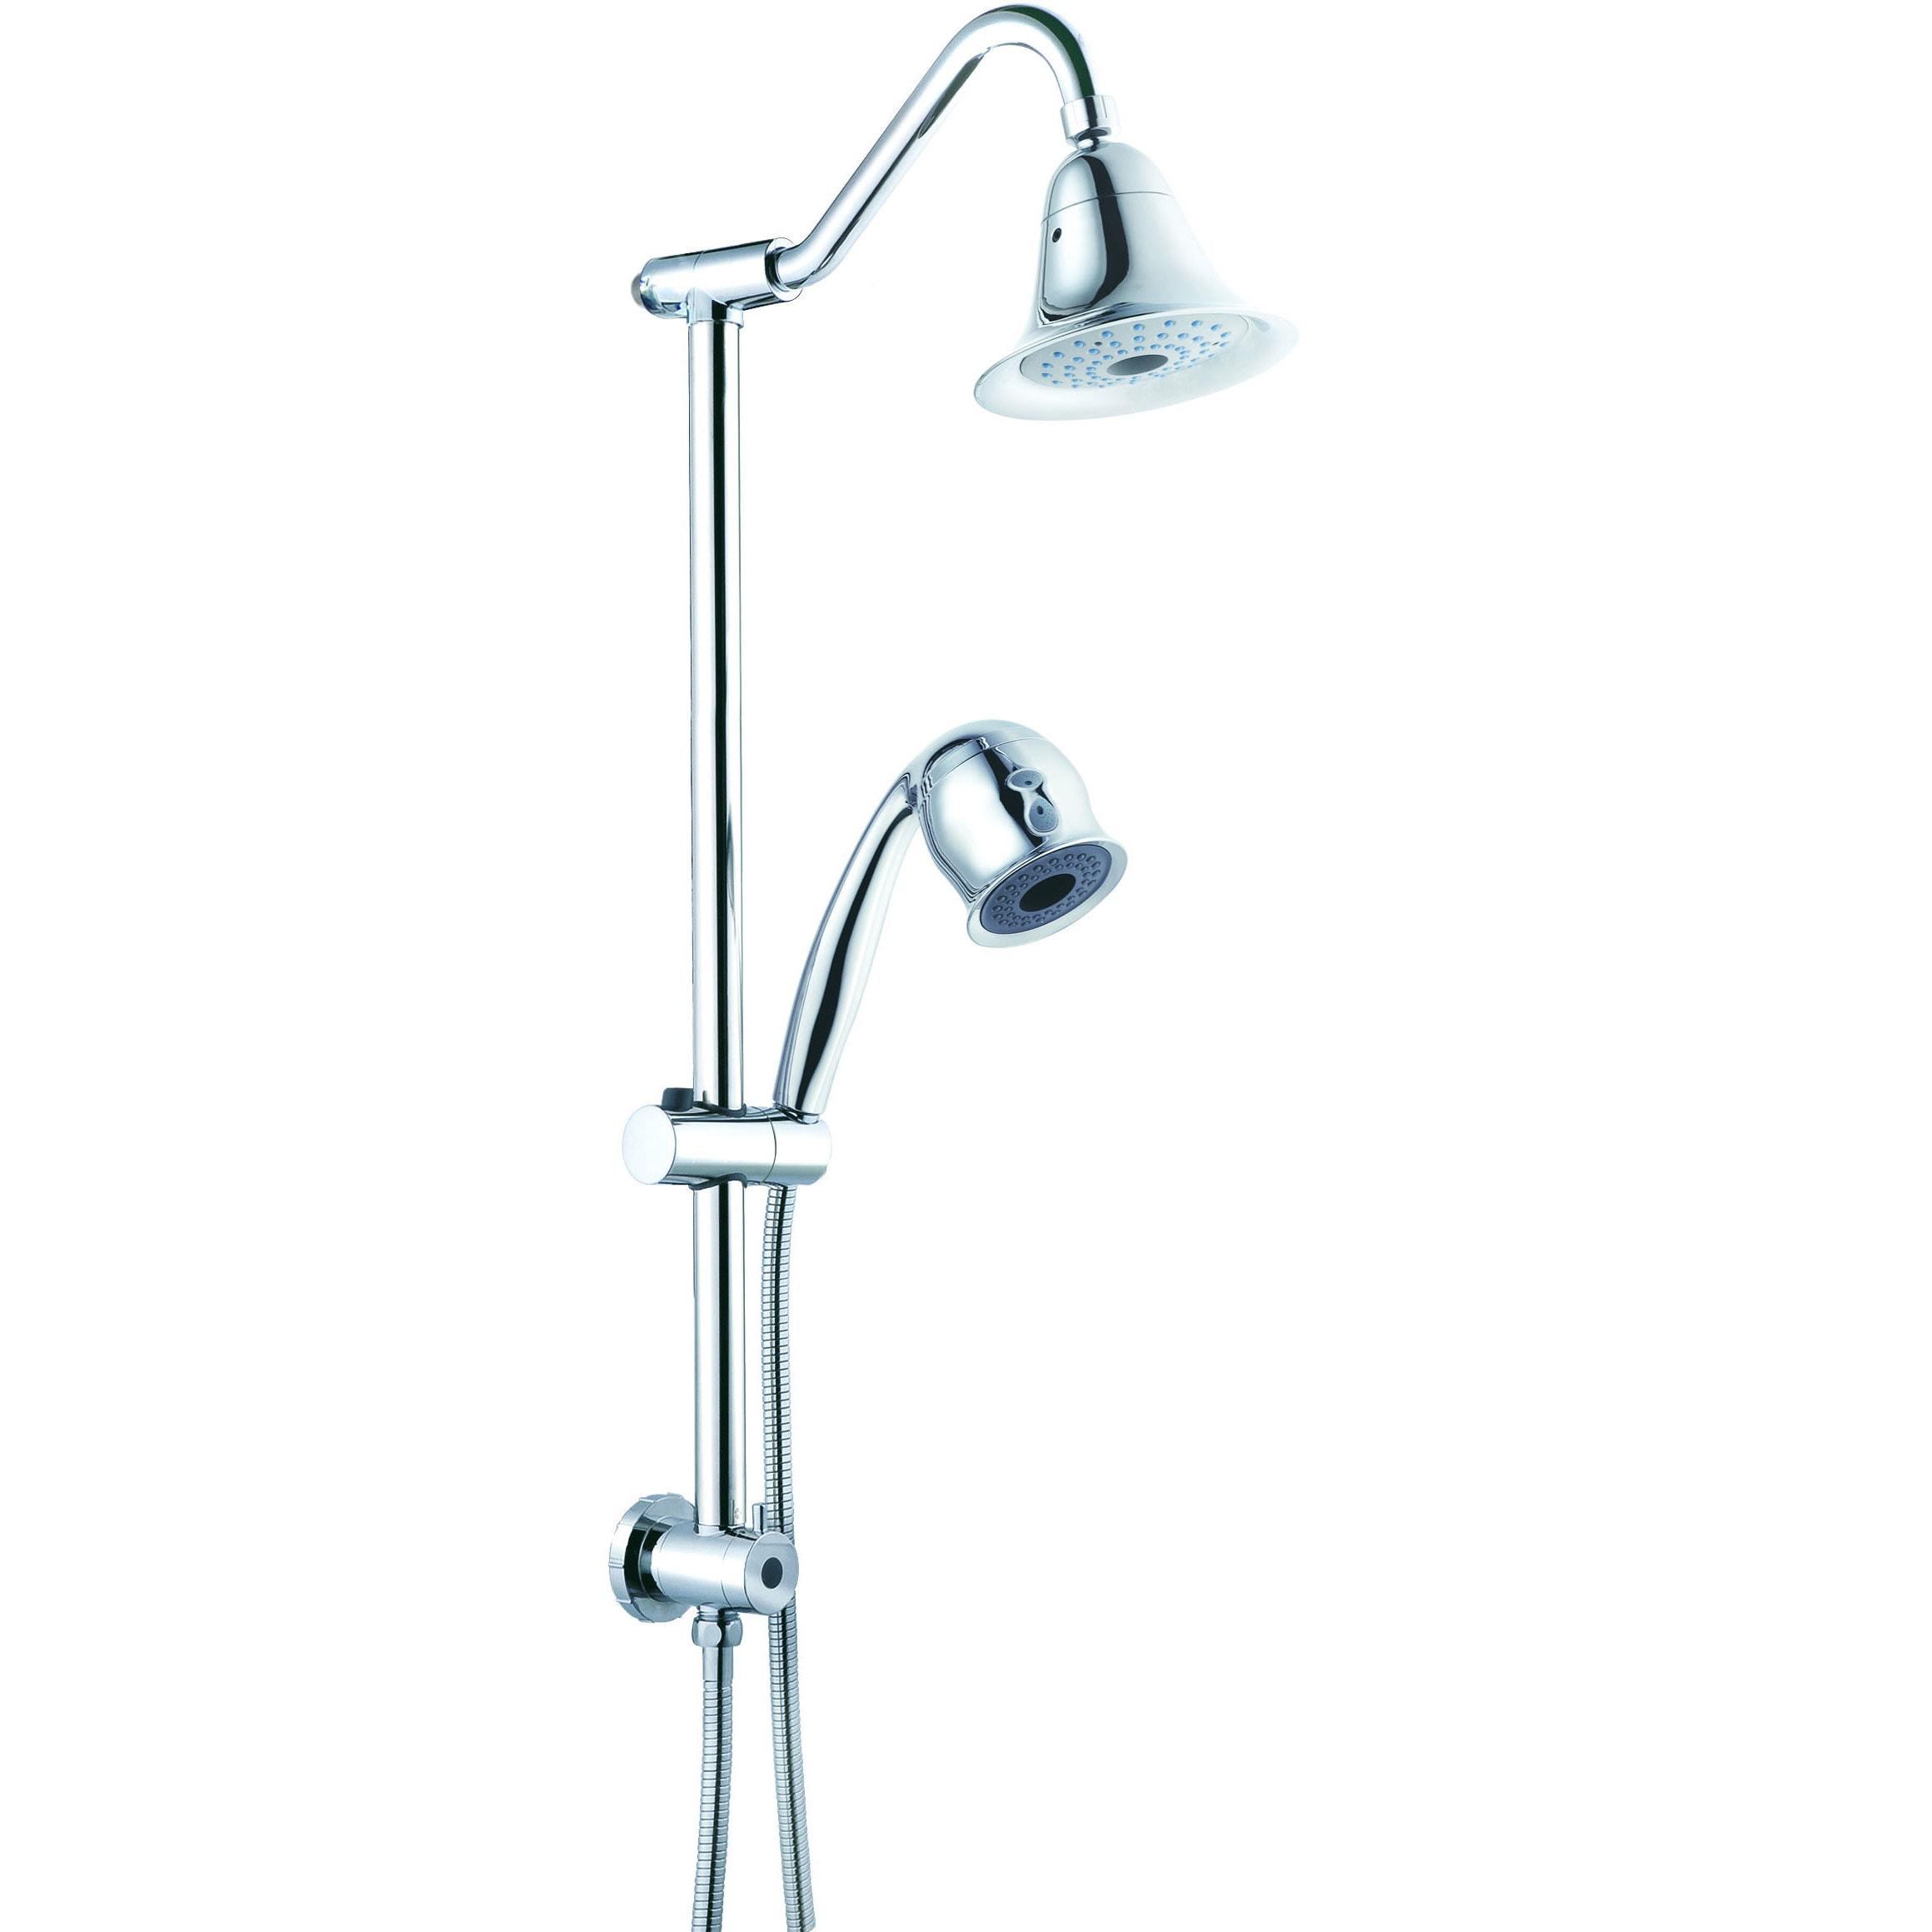 Sliding Bar Set Gooseneck Shower Arm 2 Function Hand Shower and